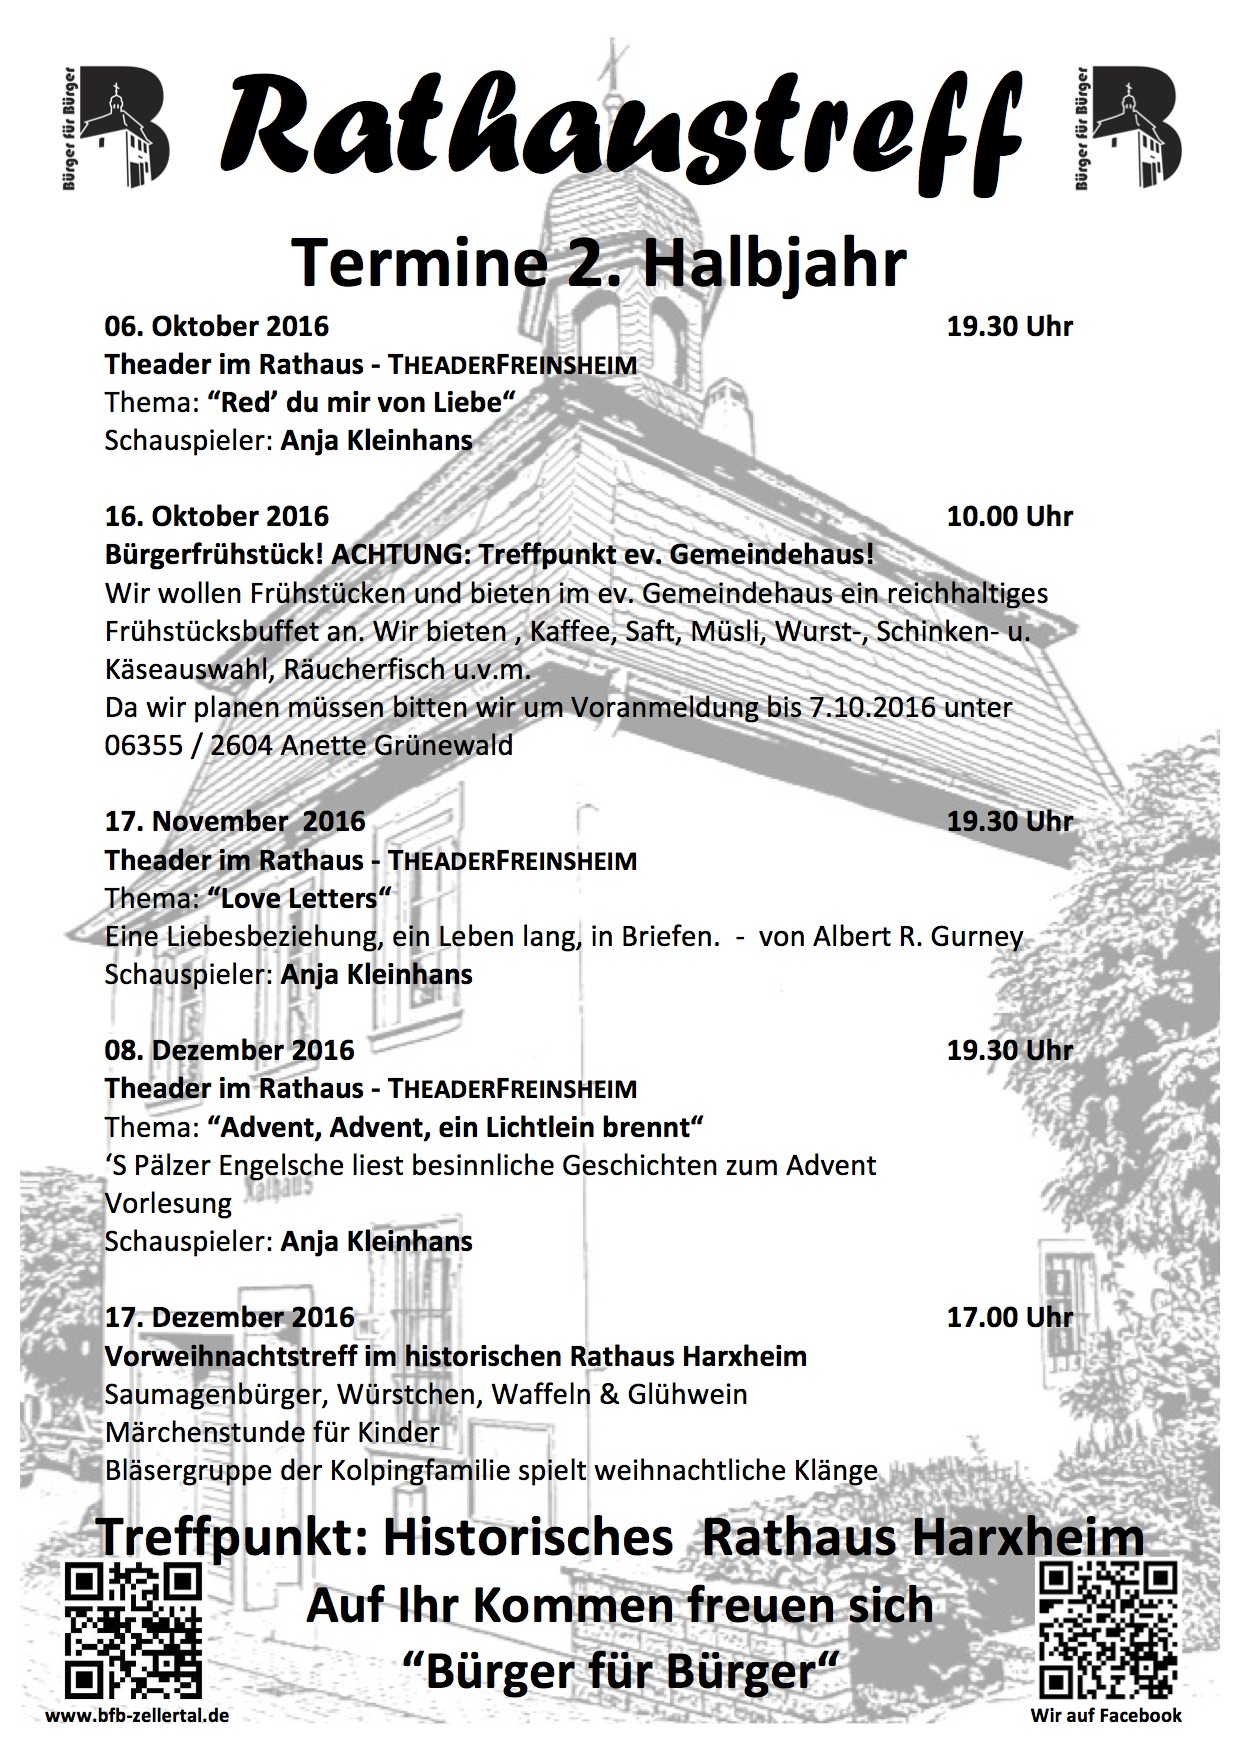 20160918-rathaustreff-termine-2